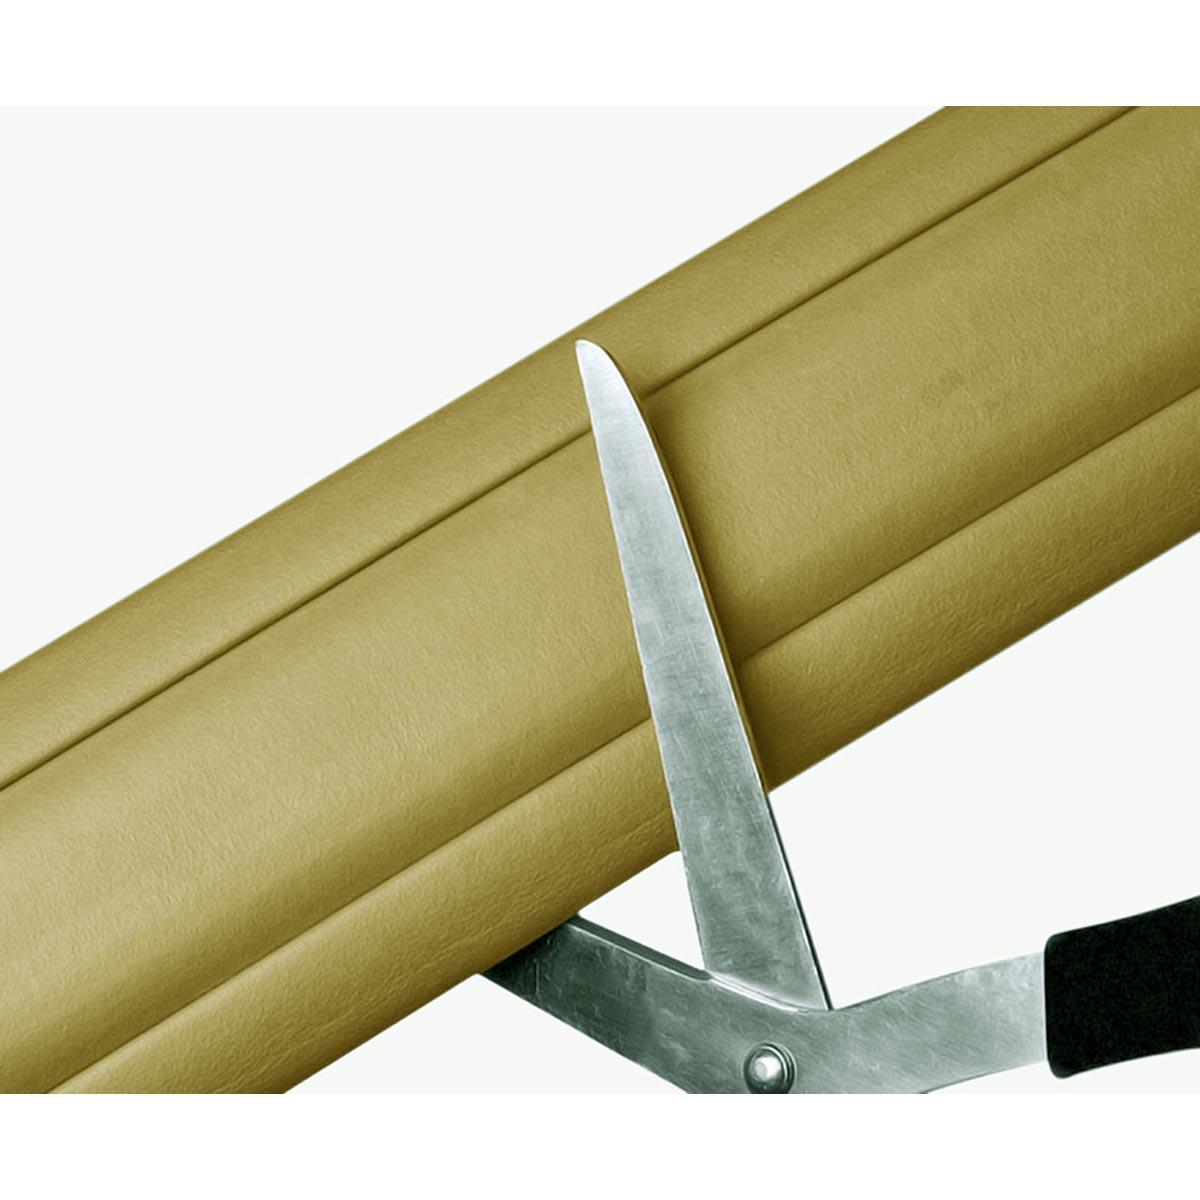 5 ft. 3-Channel Cord Protector & Concealer, Beige